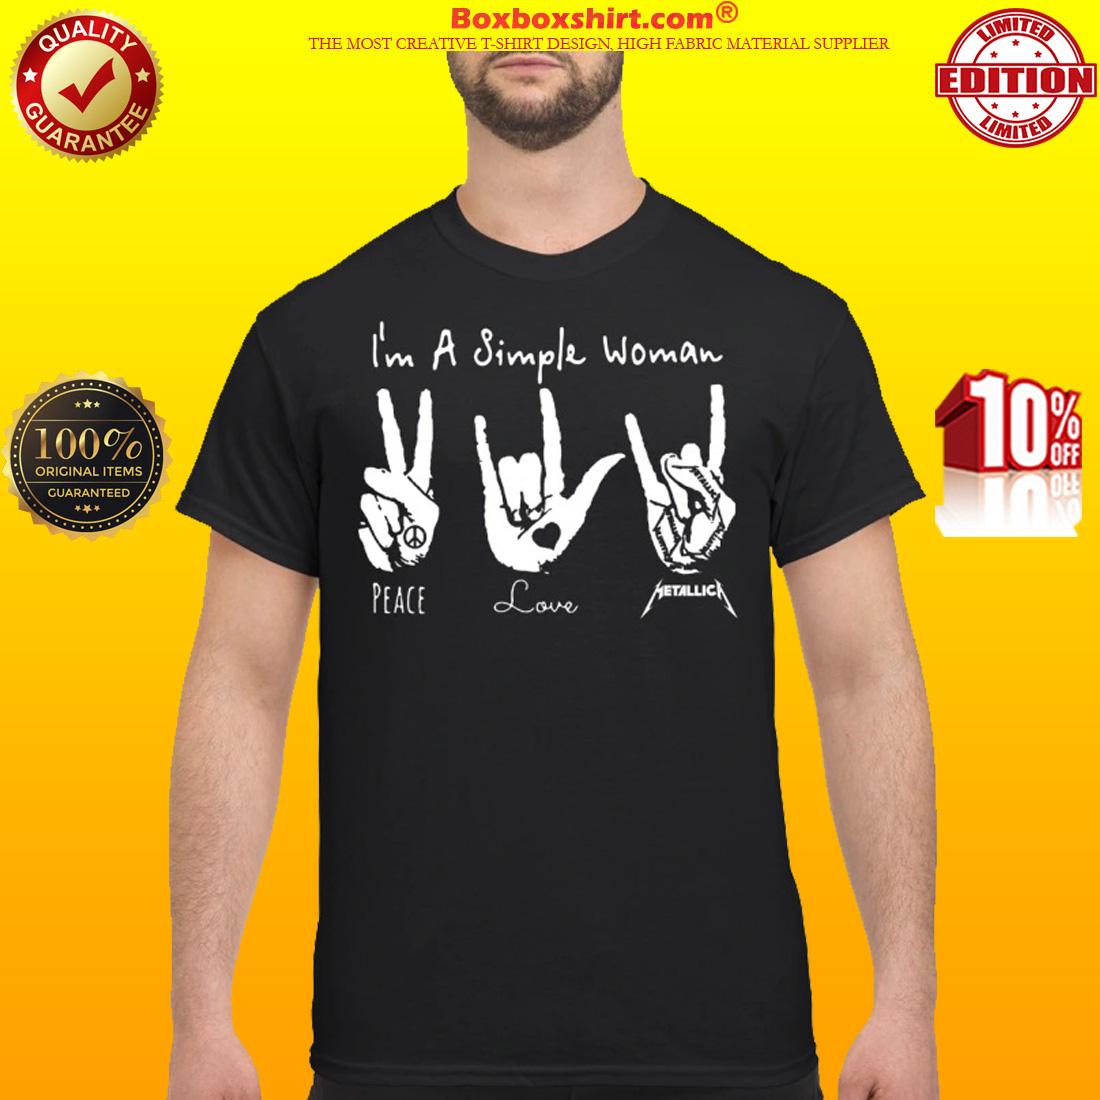 I'm a simple woman peace love Metallica classic shirt